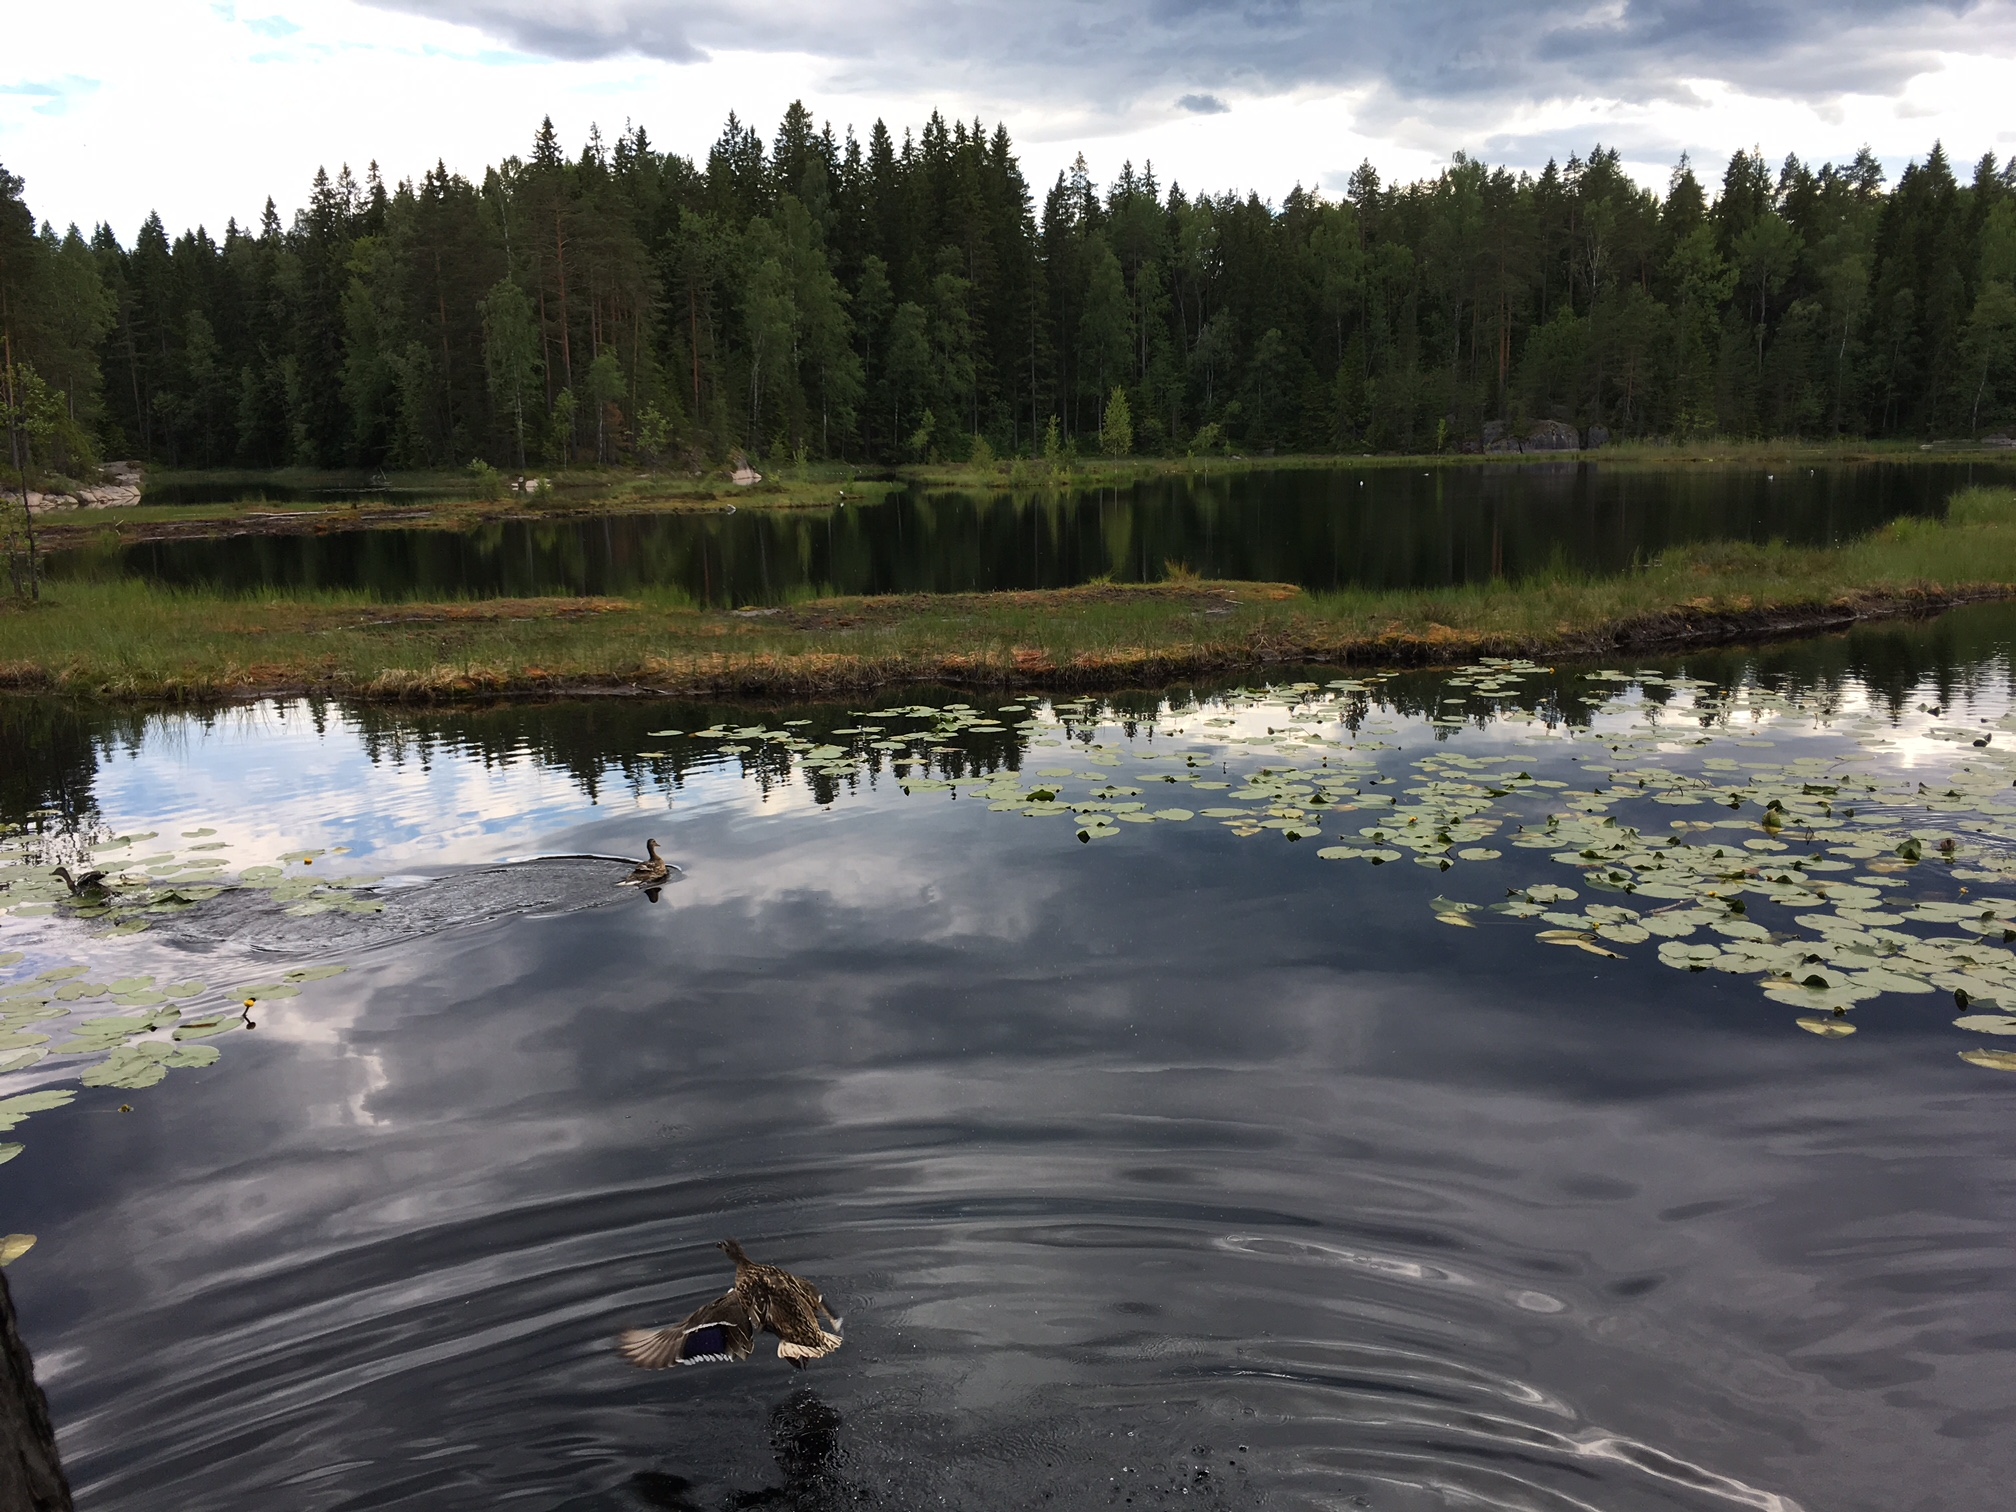 Nuuksio national park Lake Mustalampi Ducks